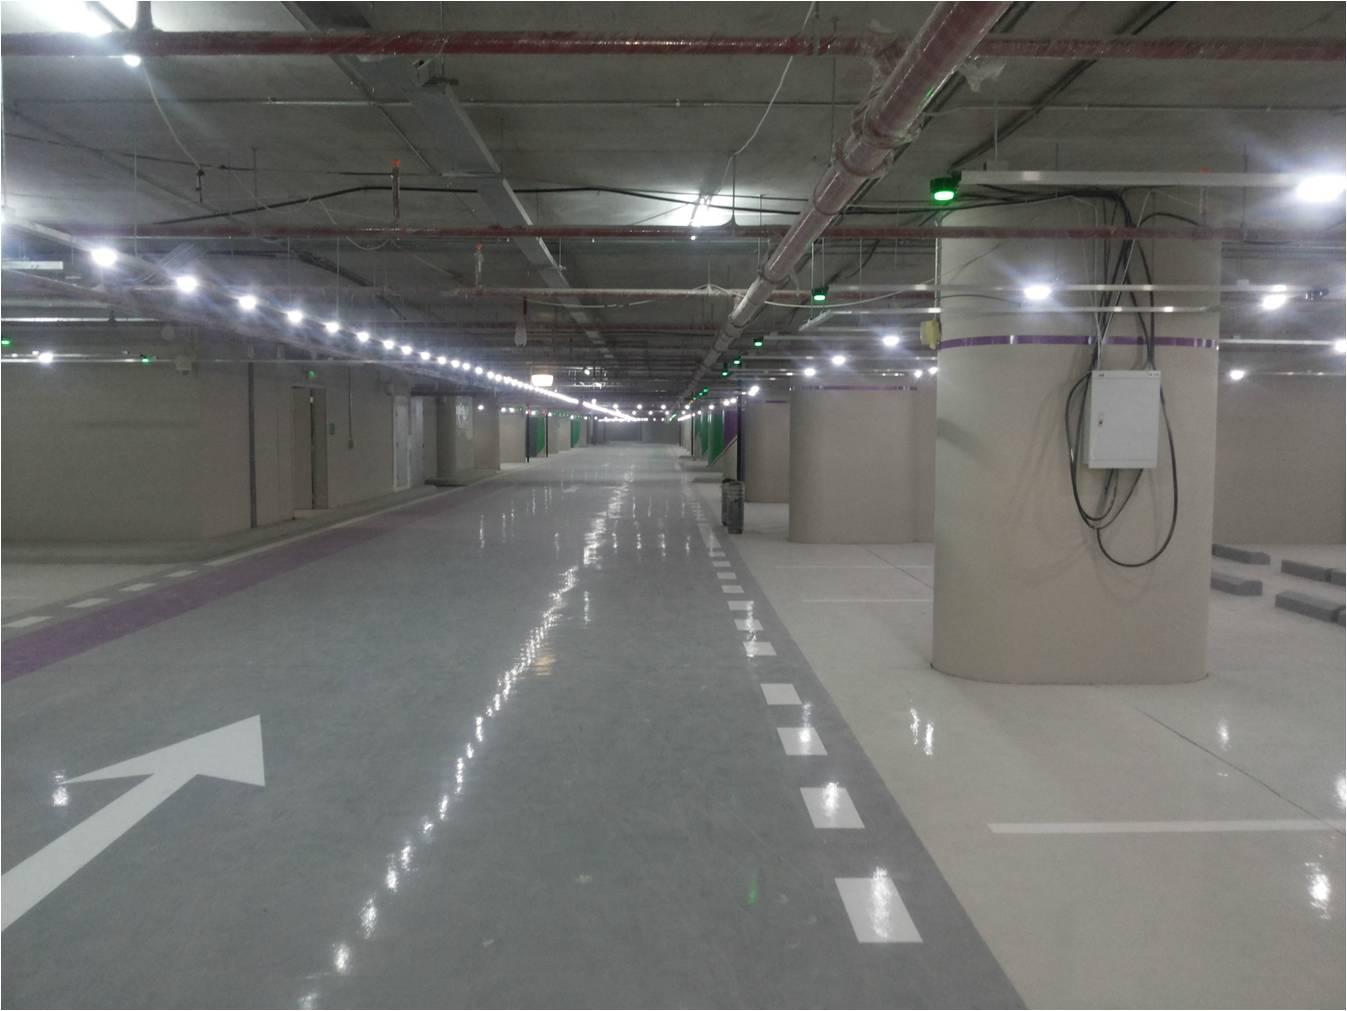 Circontrol Parking Guidance System abdalli mall